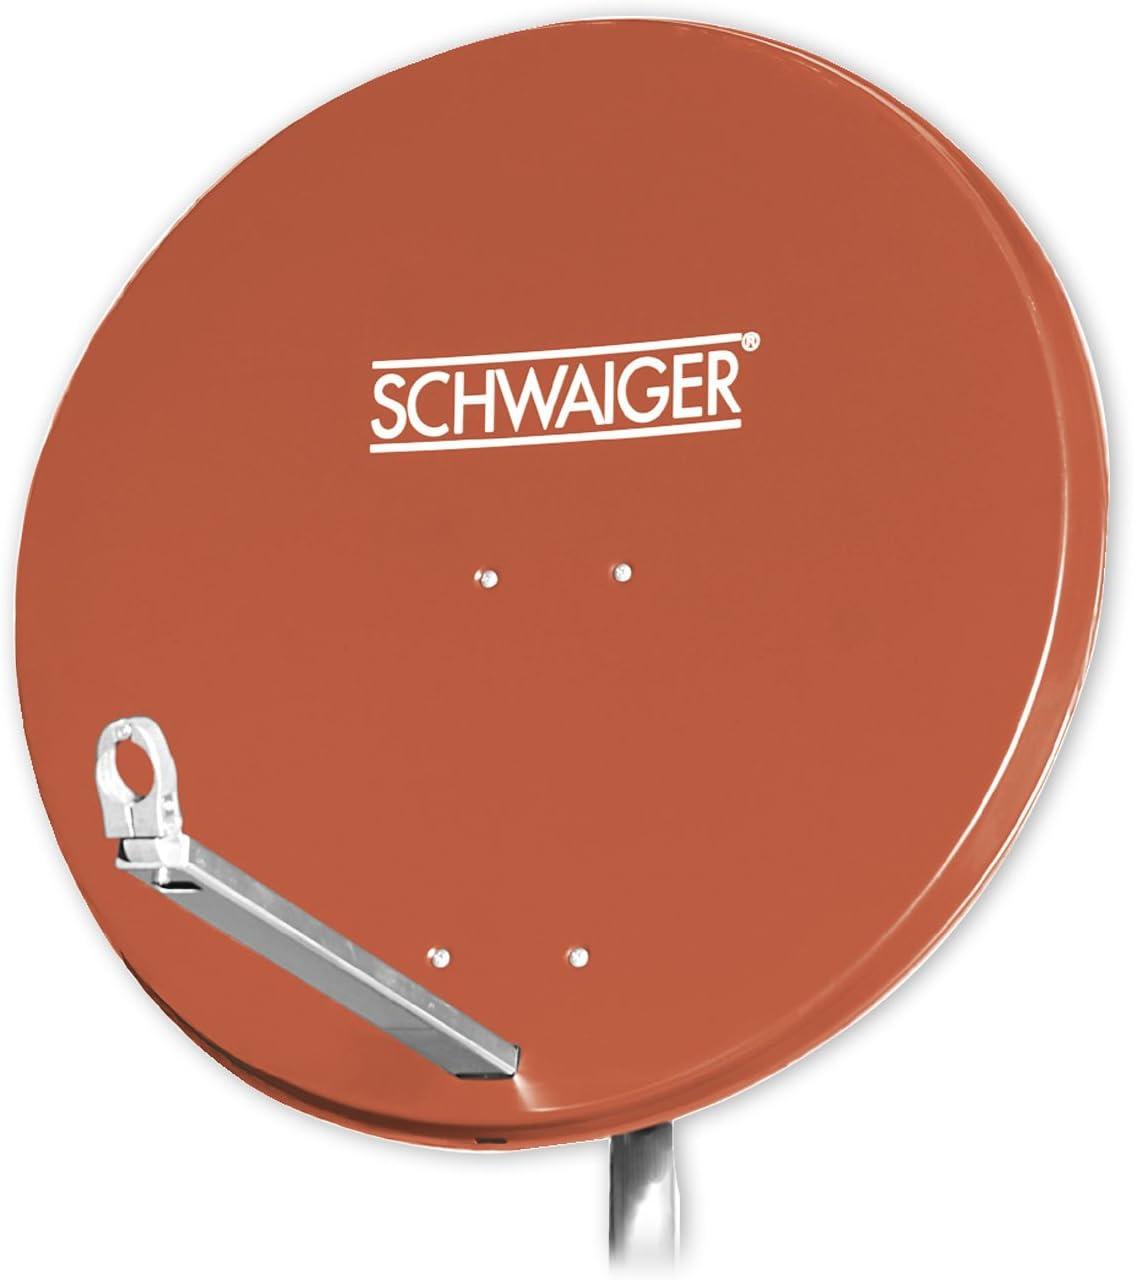 Schwaiger Spi900 2 Aluminium Offset Antenne 88 Cm Elektronik